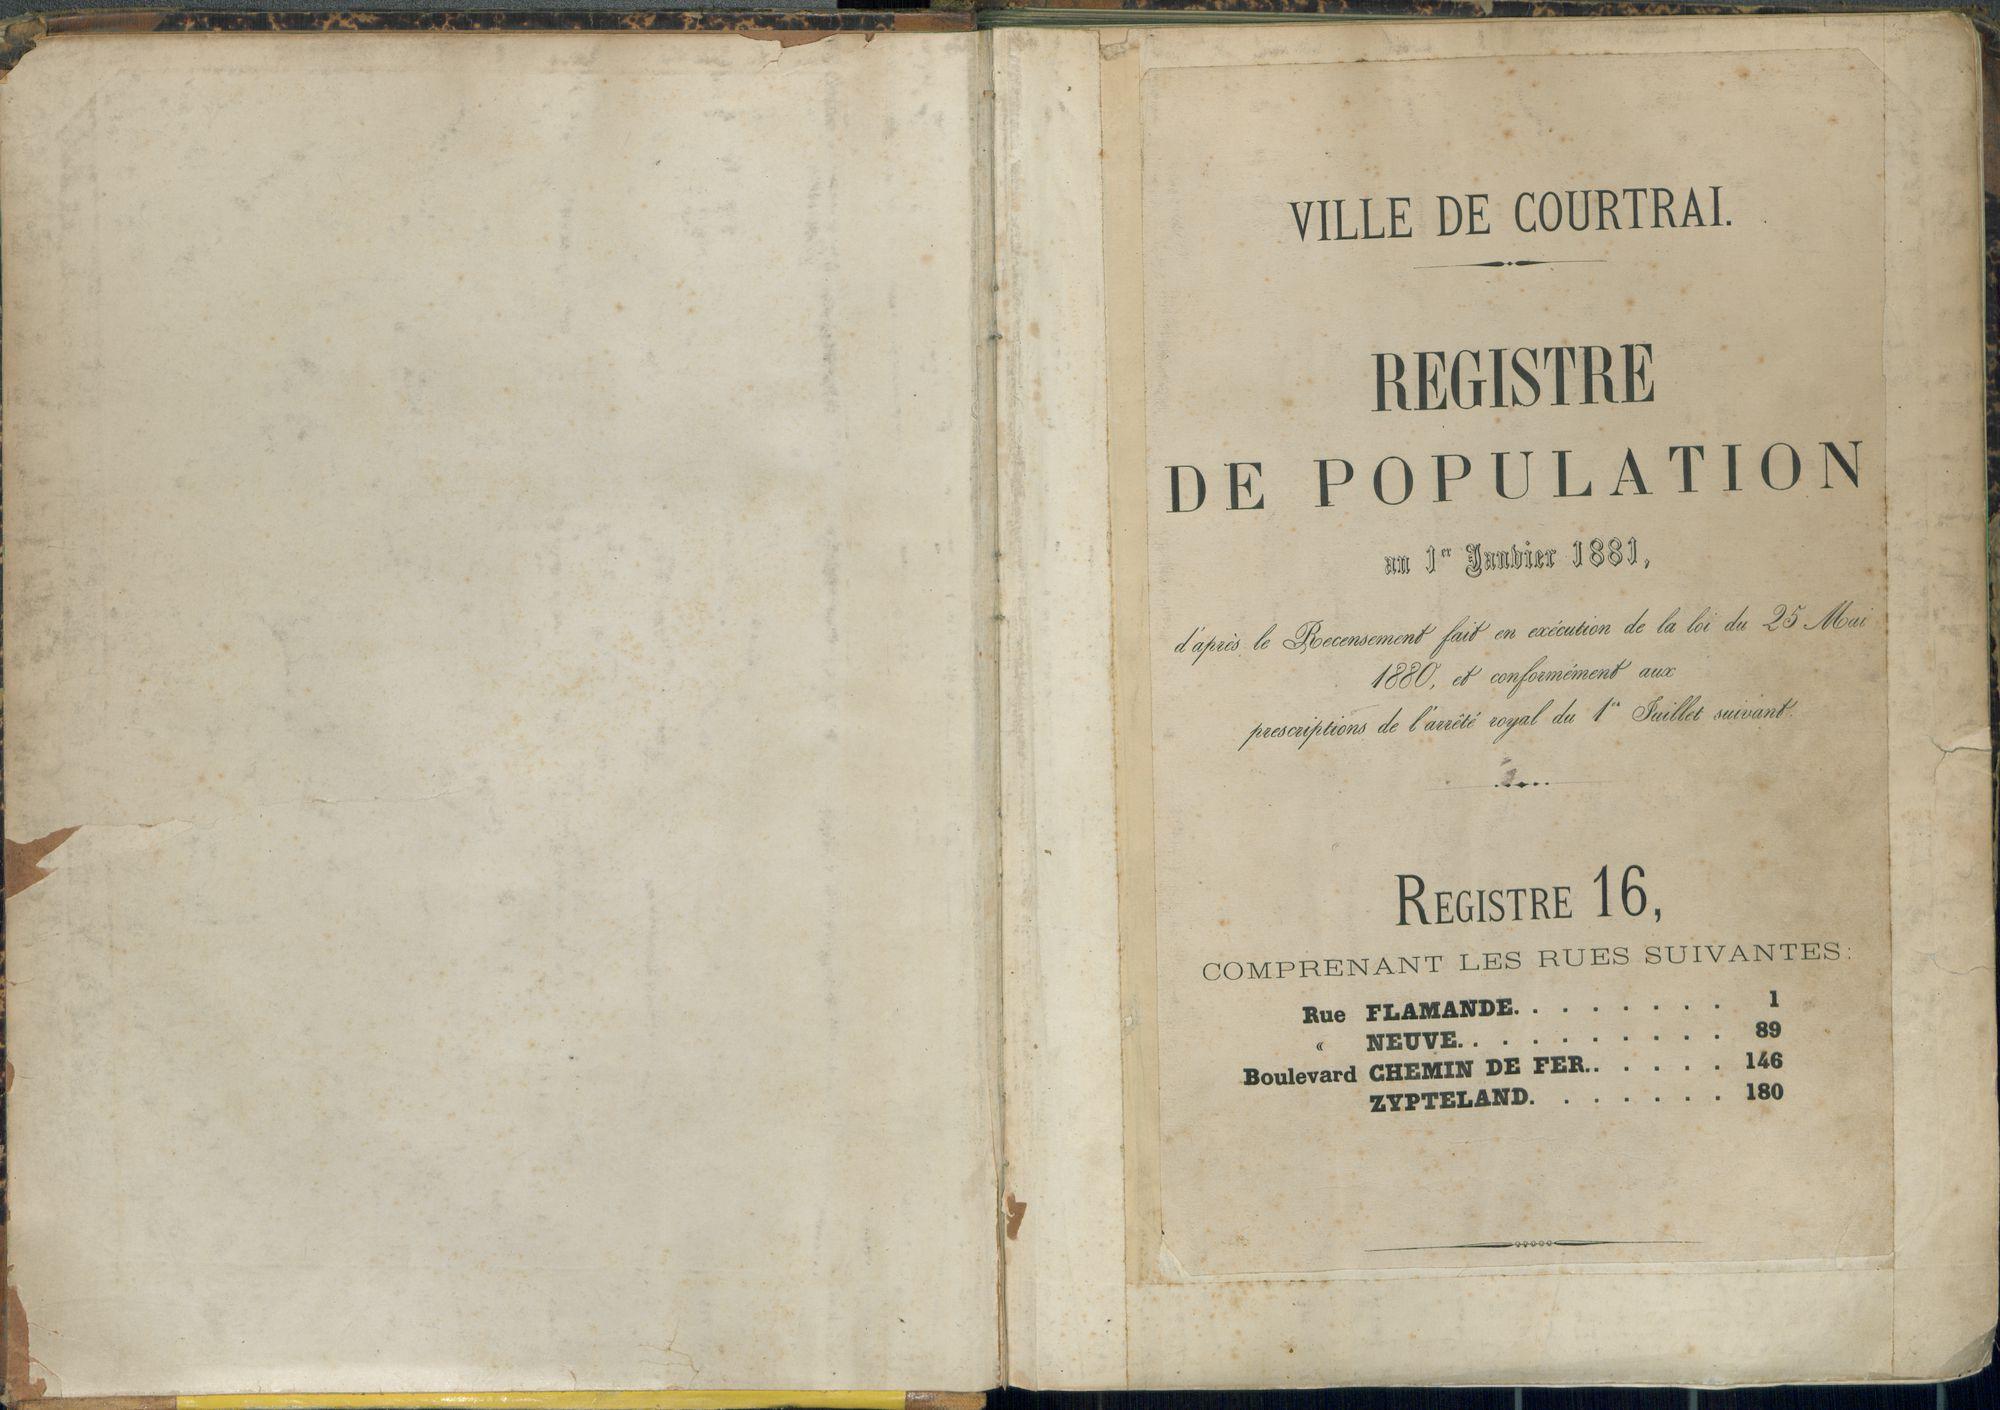 Bevolkingsregister Kortrijk 1880 boek 16